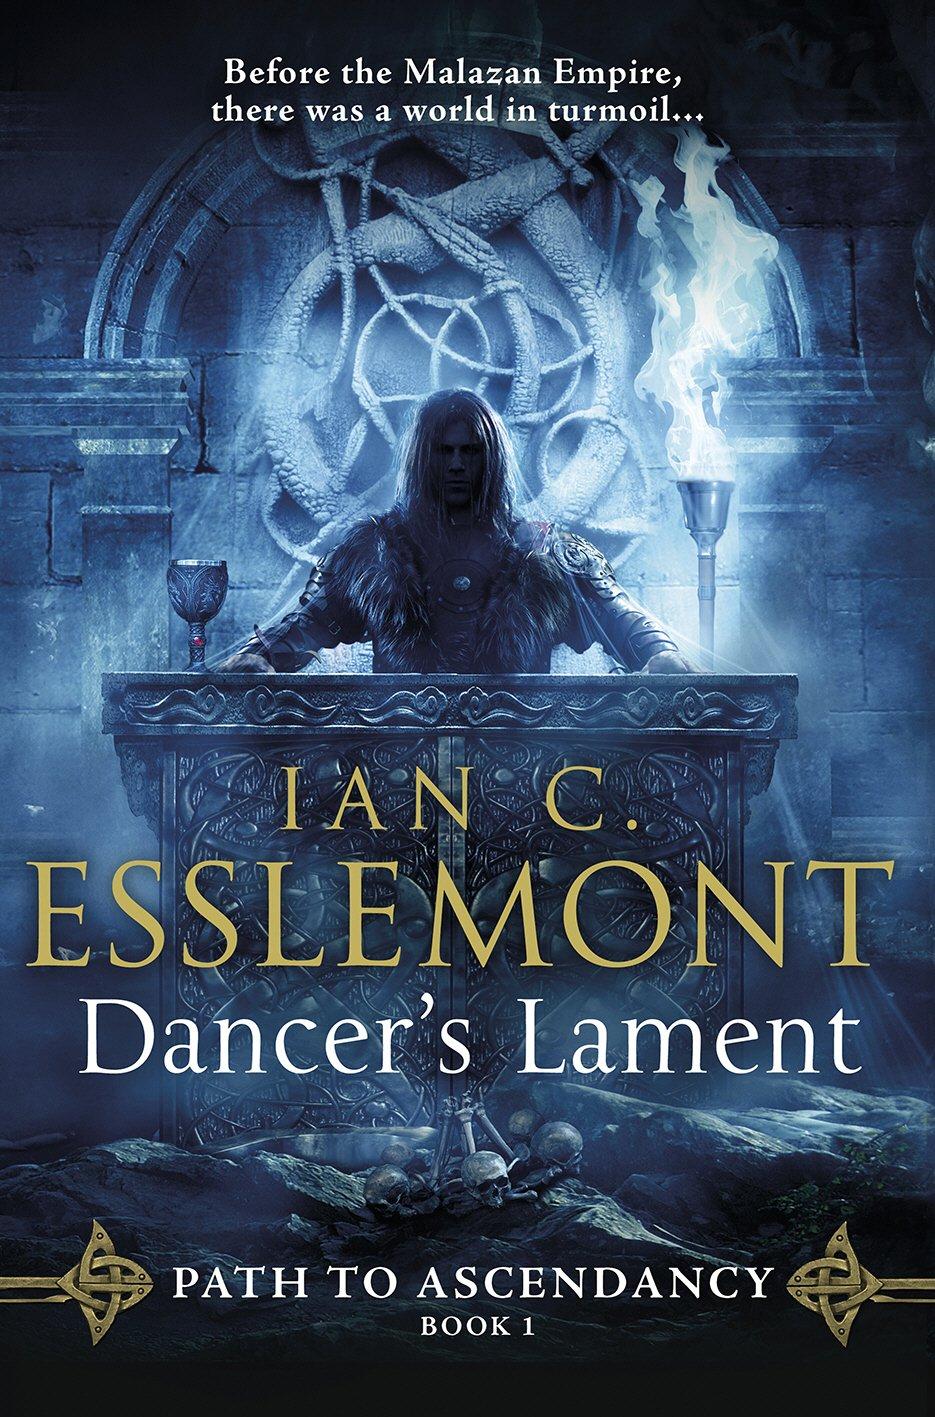 Dancer's Lament